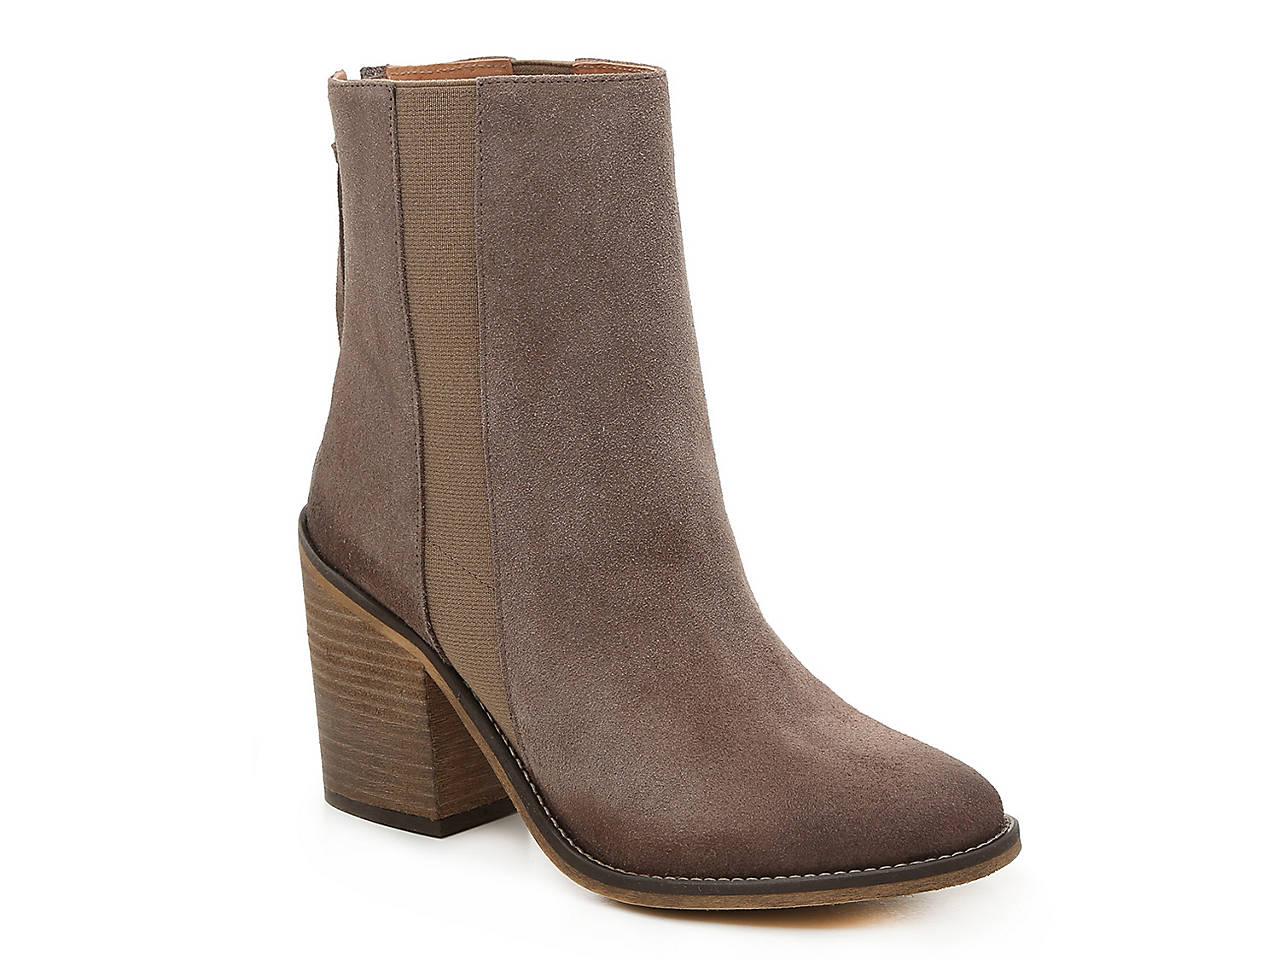 9f1359e87f6 Rebels Zabrina Bootie Women s Shoes